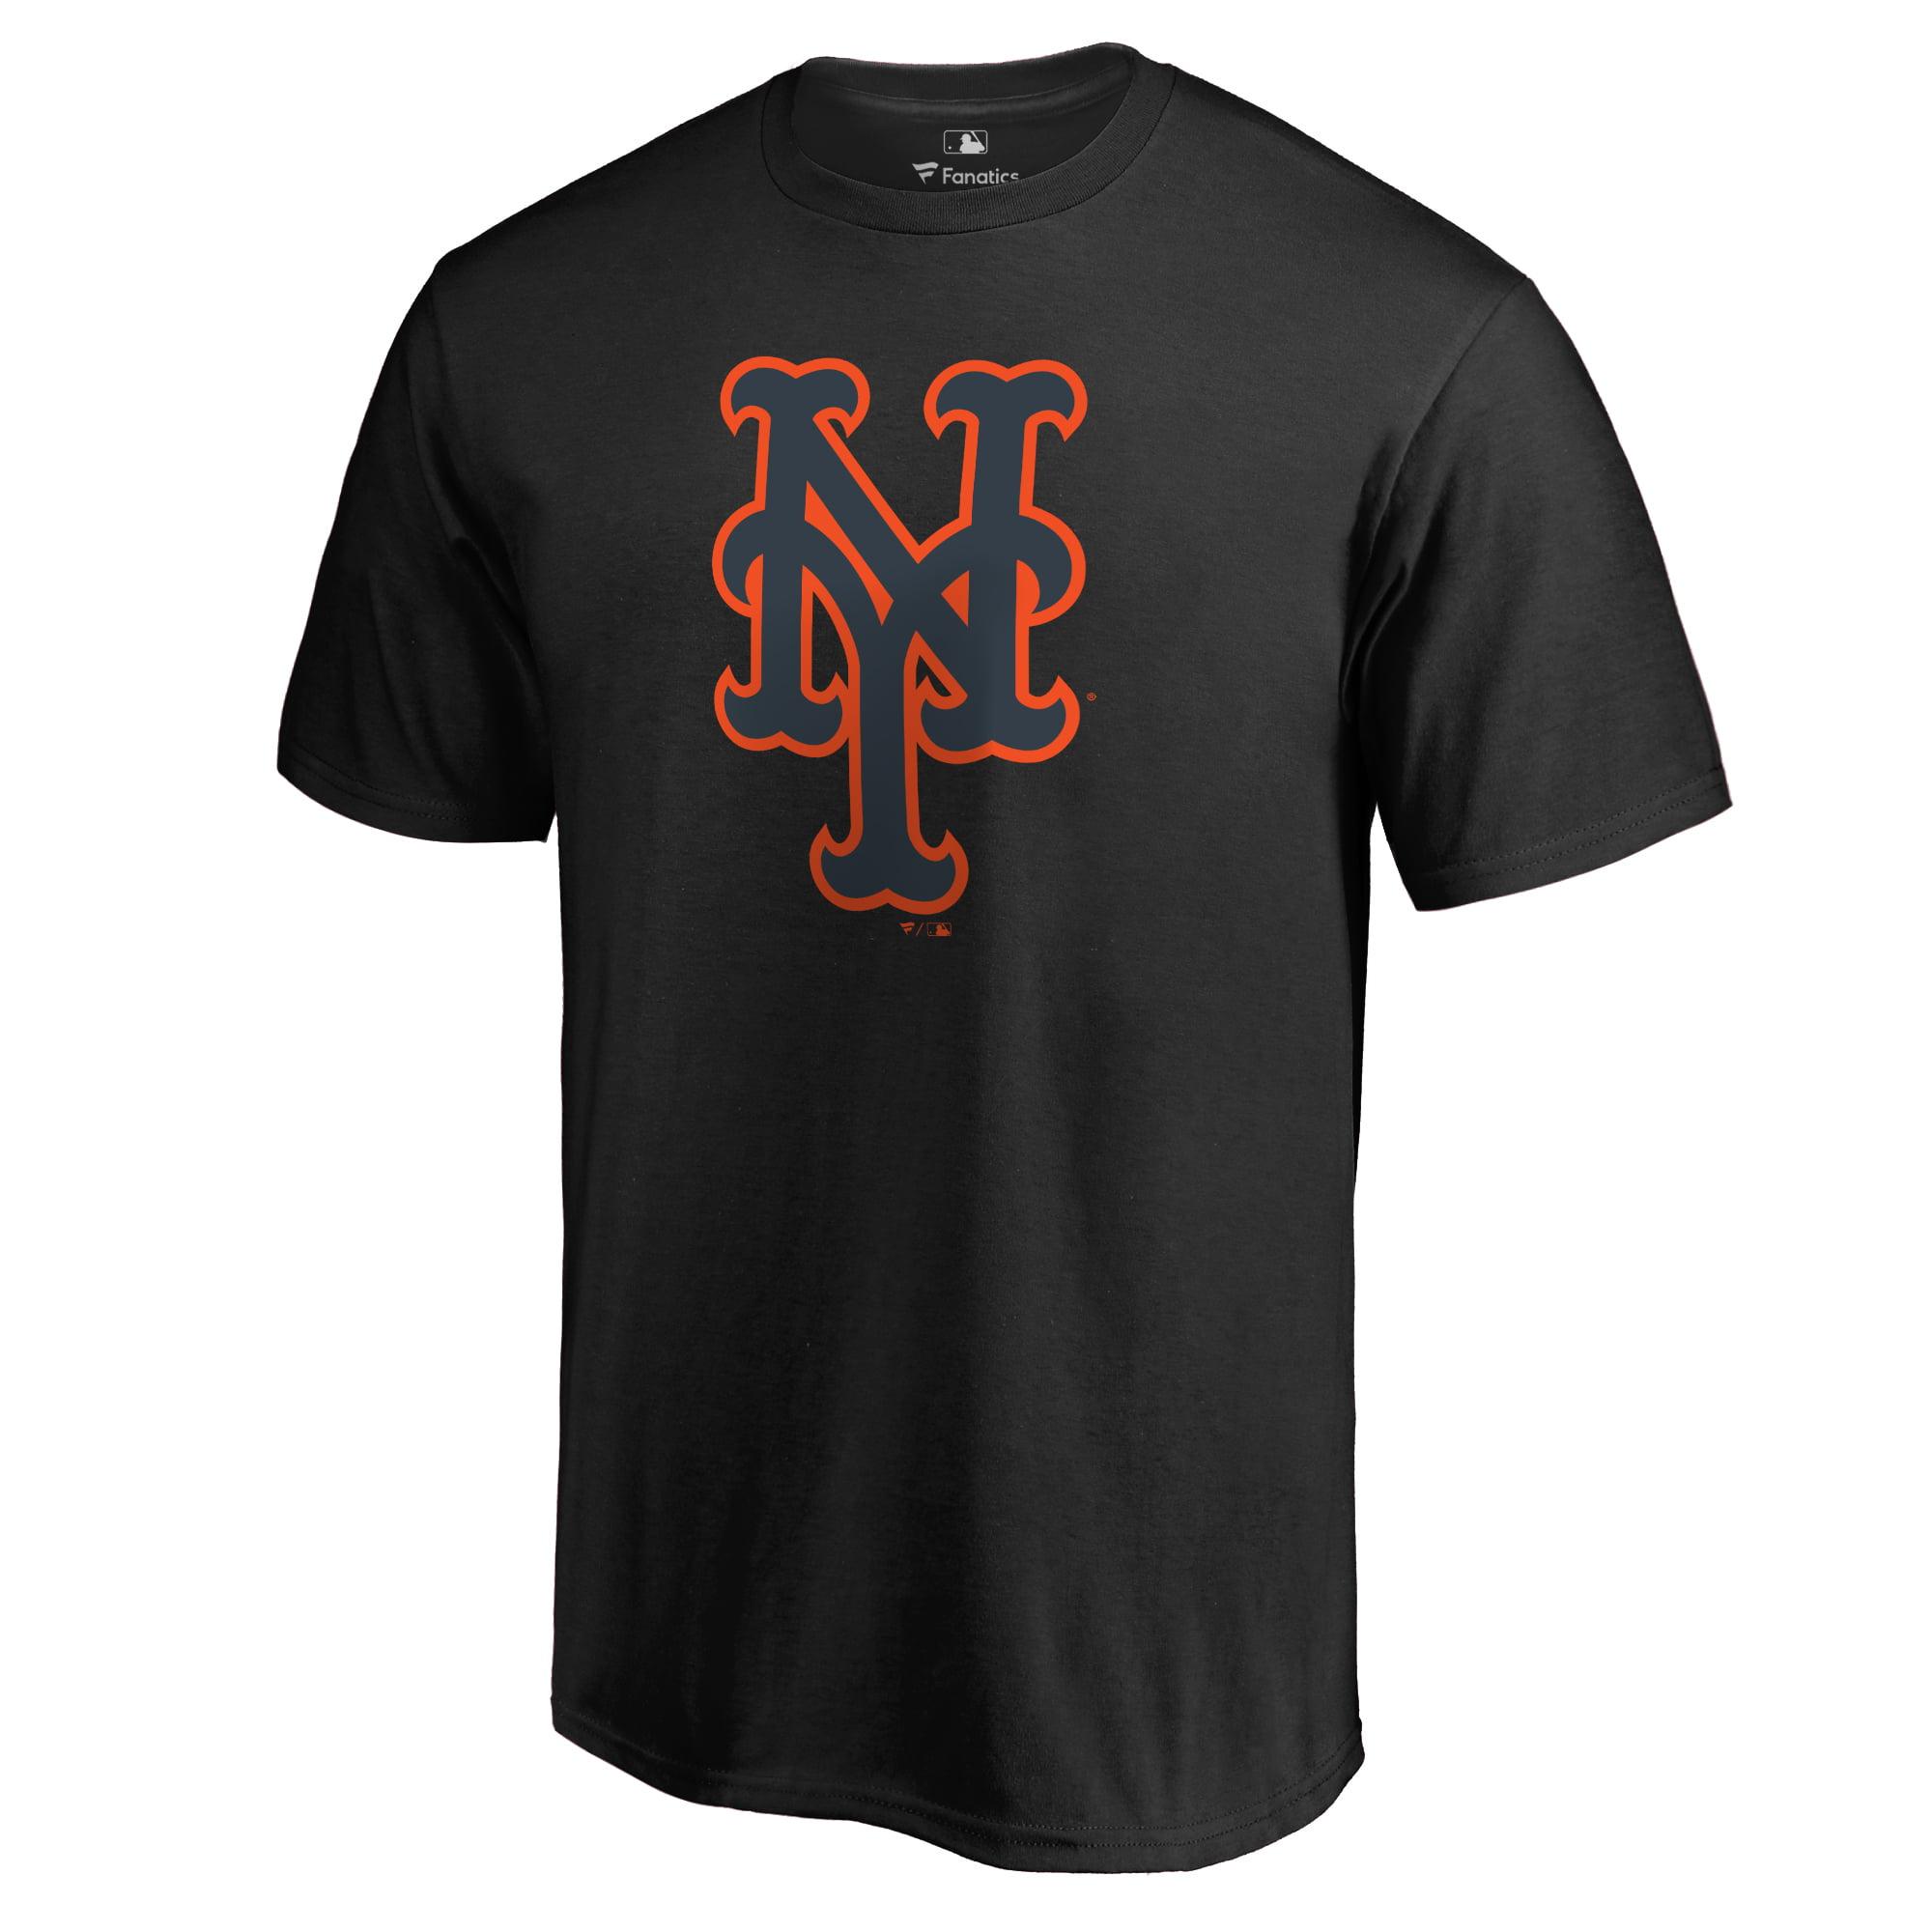 size 40 d2187 705e5 ireland new york mets black jersey 08575 0454e